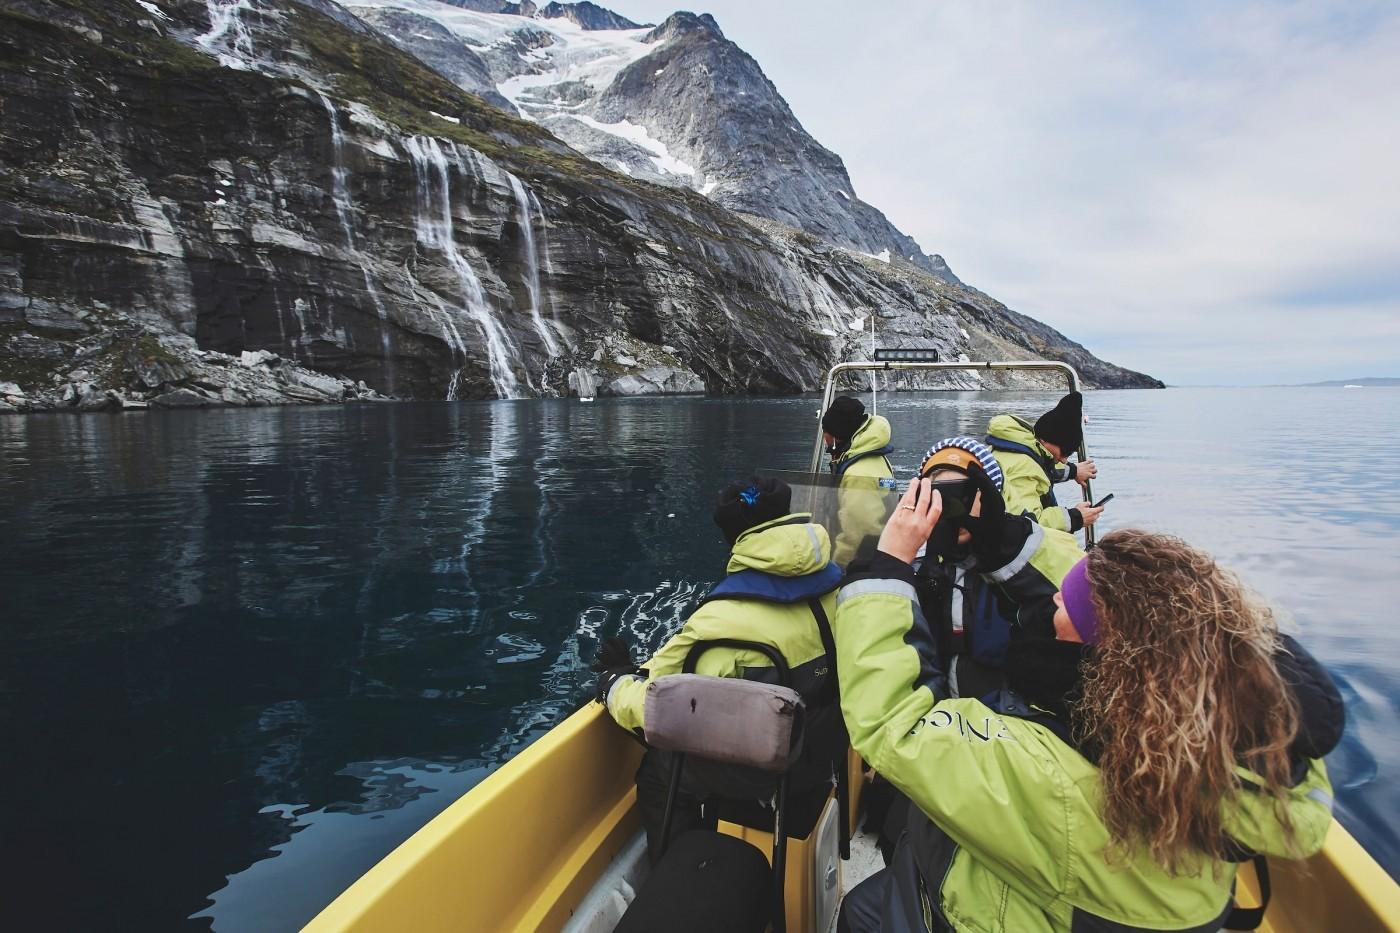 Nuuk Water Taxi stopping at a waterfall. Photo by: Aningaaq Rosing Carlsen - Visit Greenland